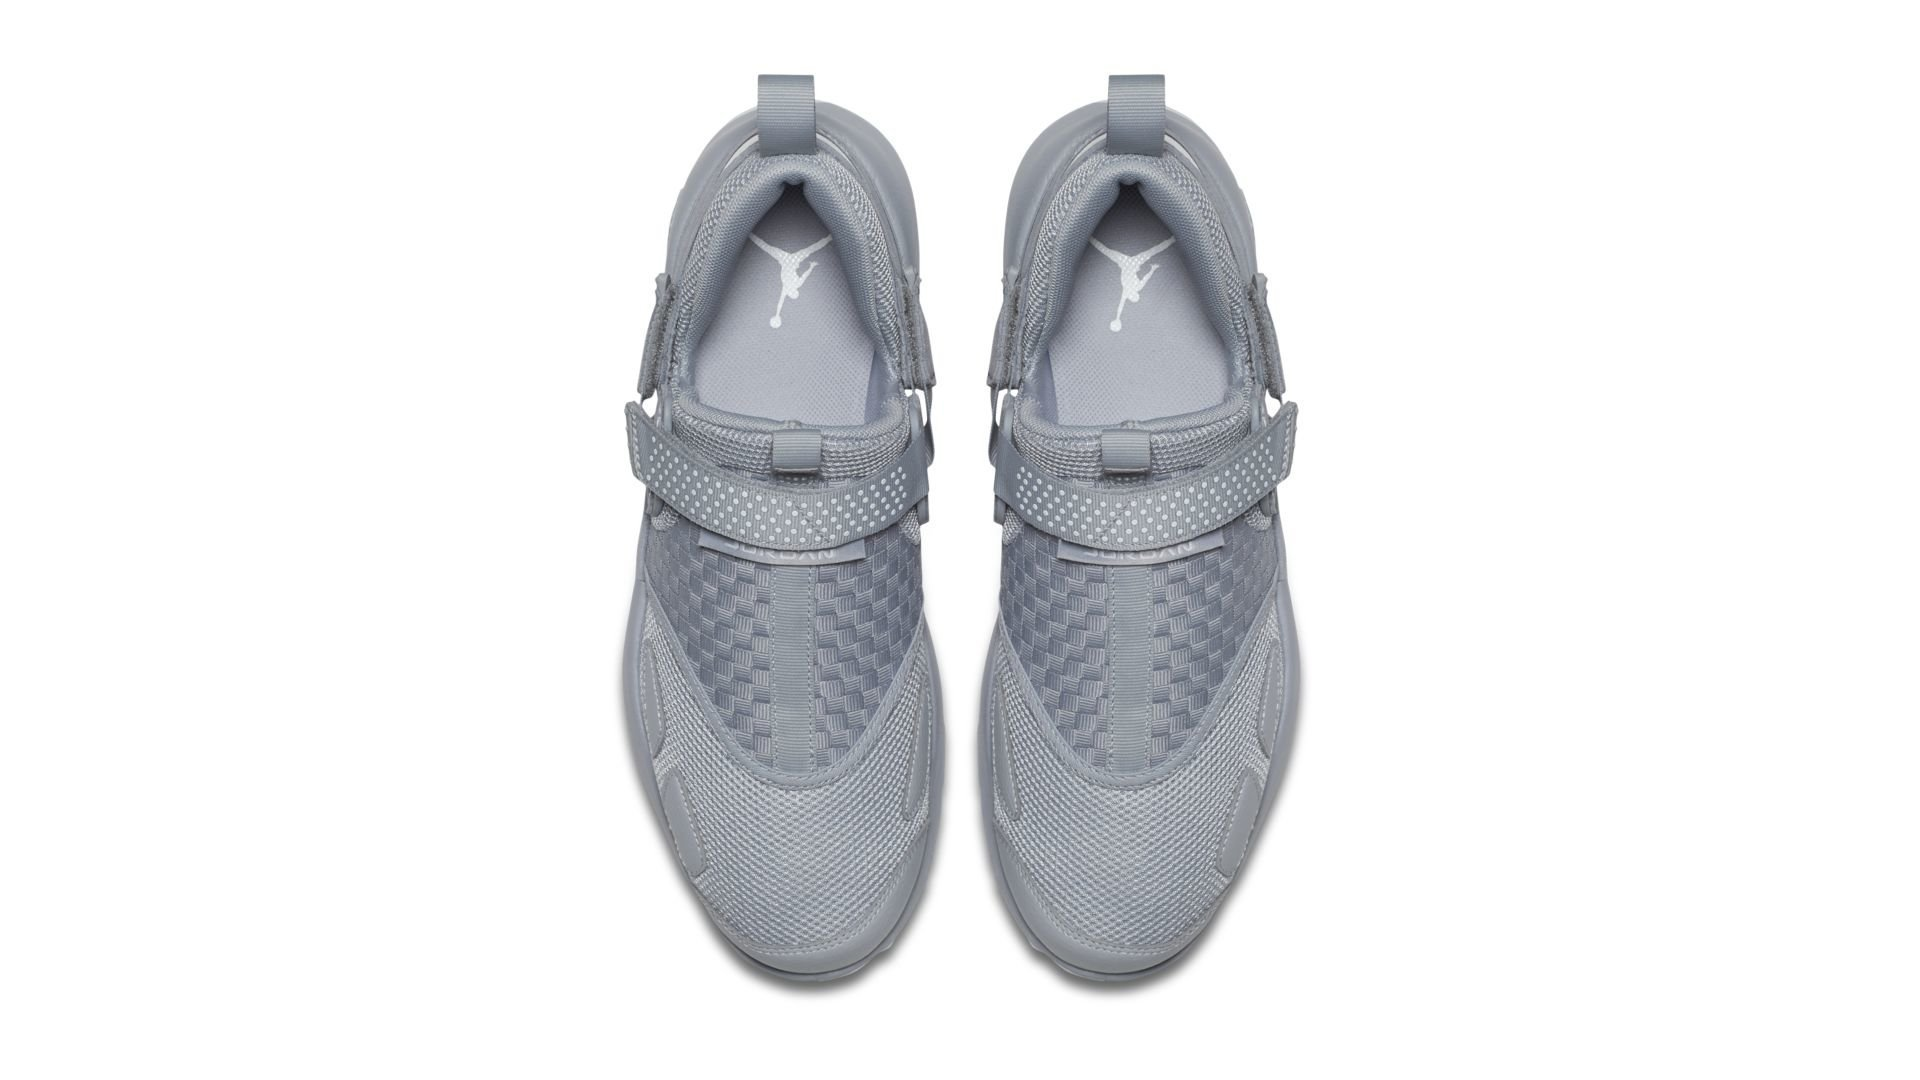 Jordan Trunner LX Wolf Grey (897992-003)